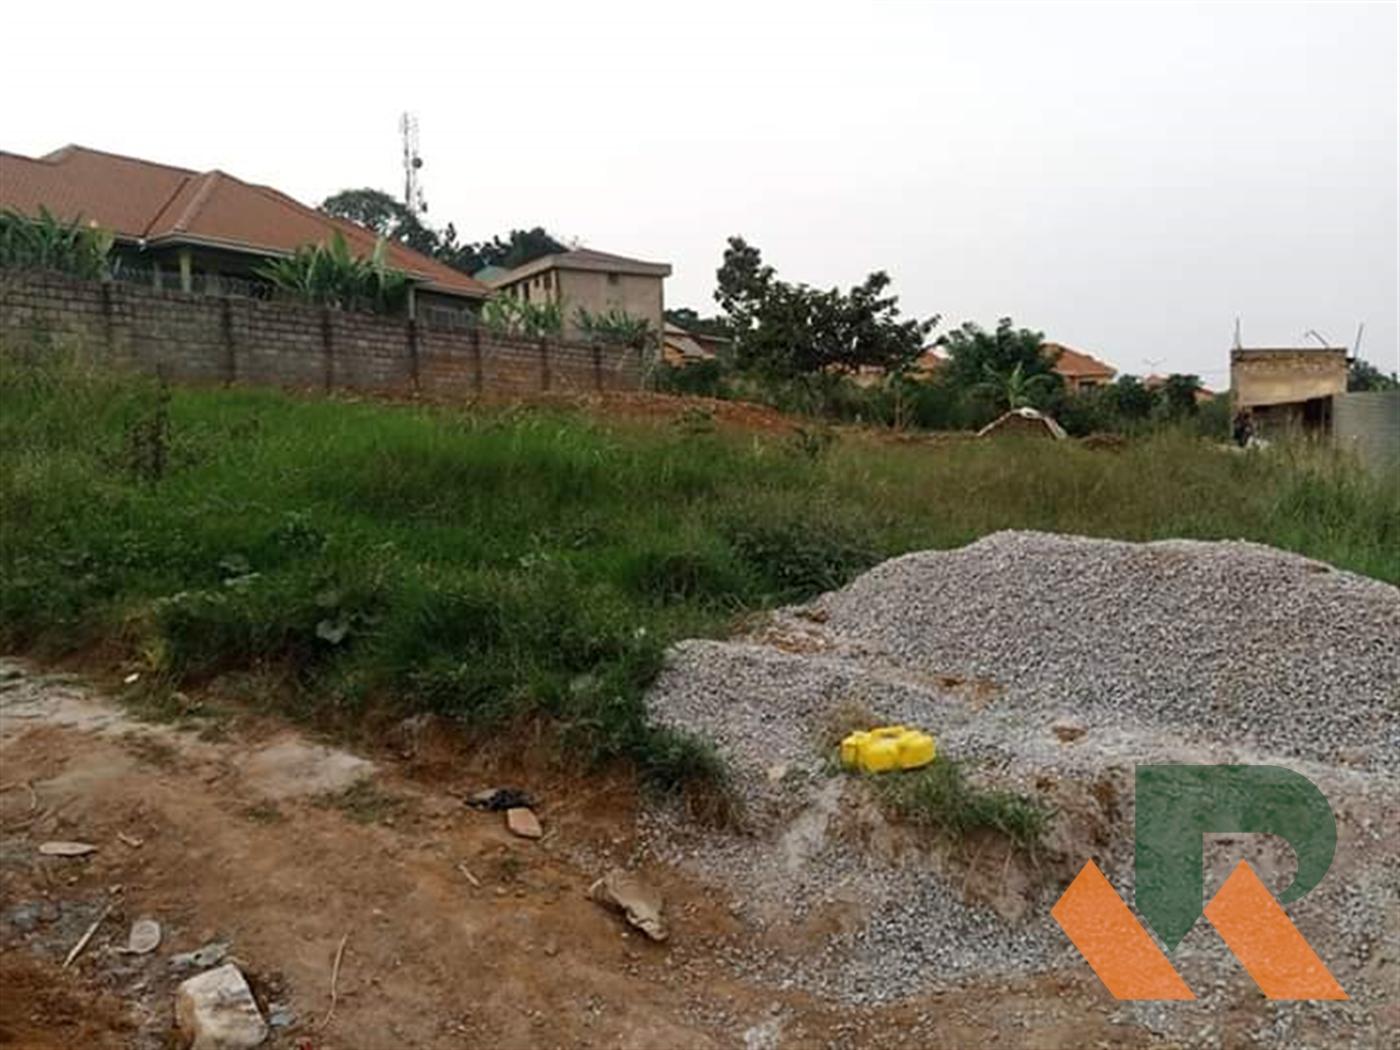 Residential Land for sale in Kyaliwajjala Kampala